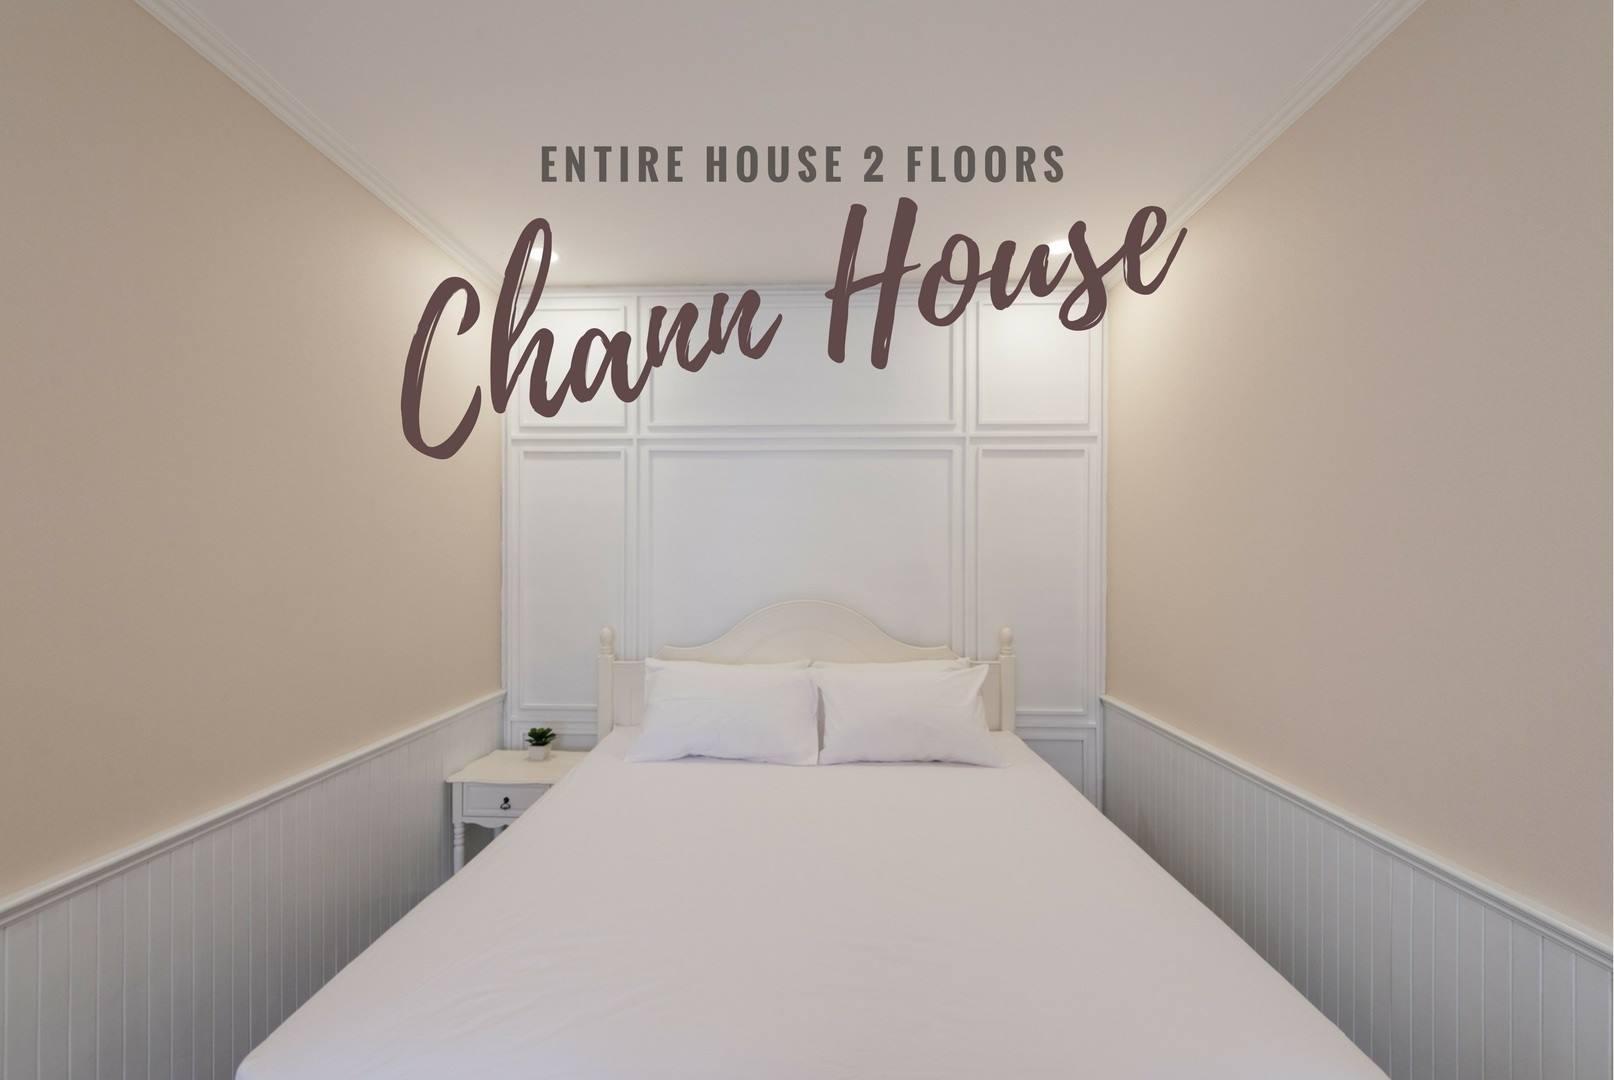 Chann House